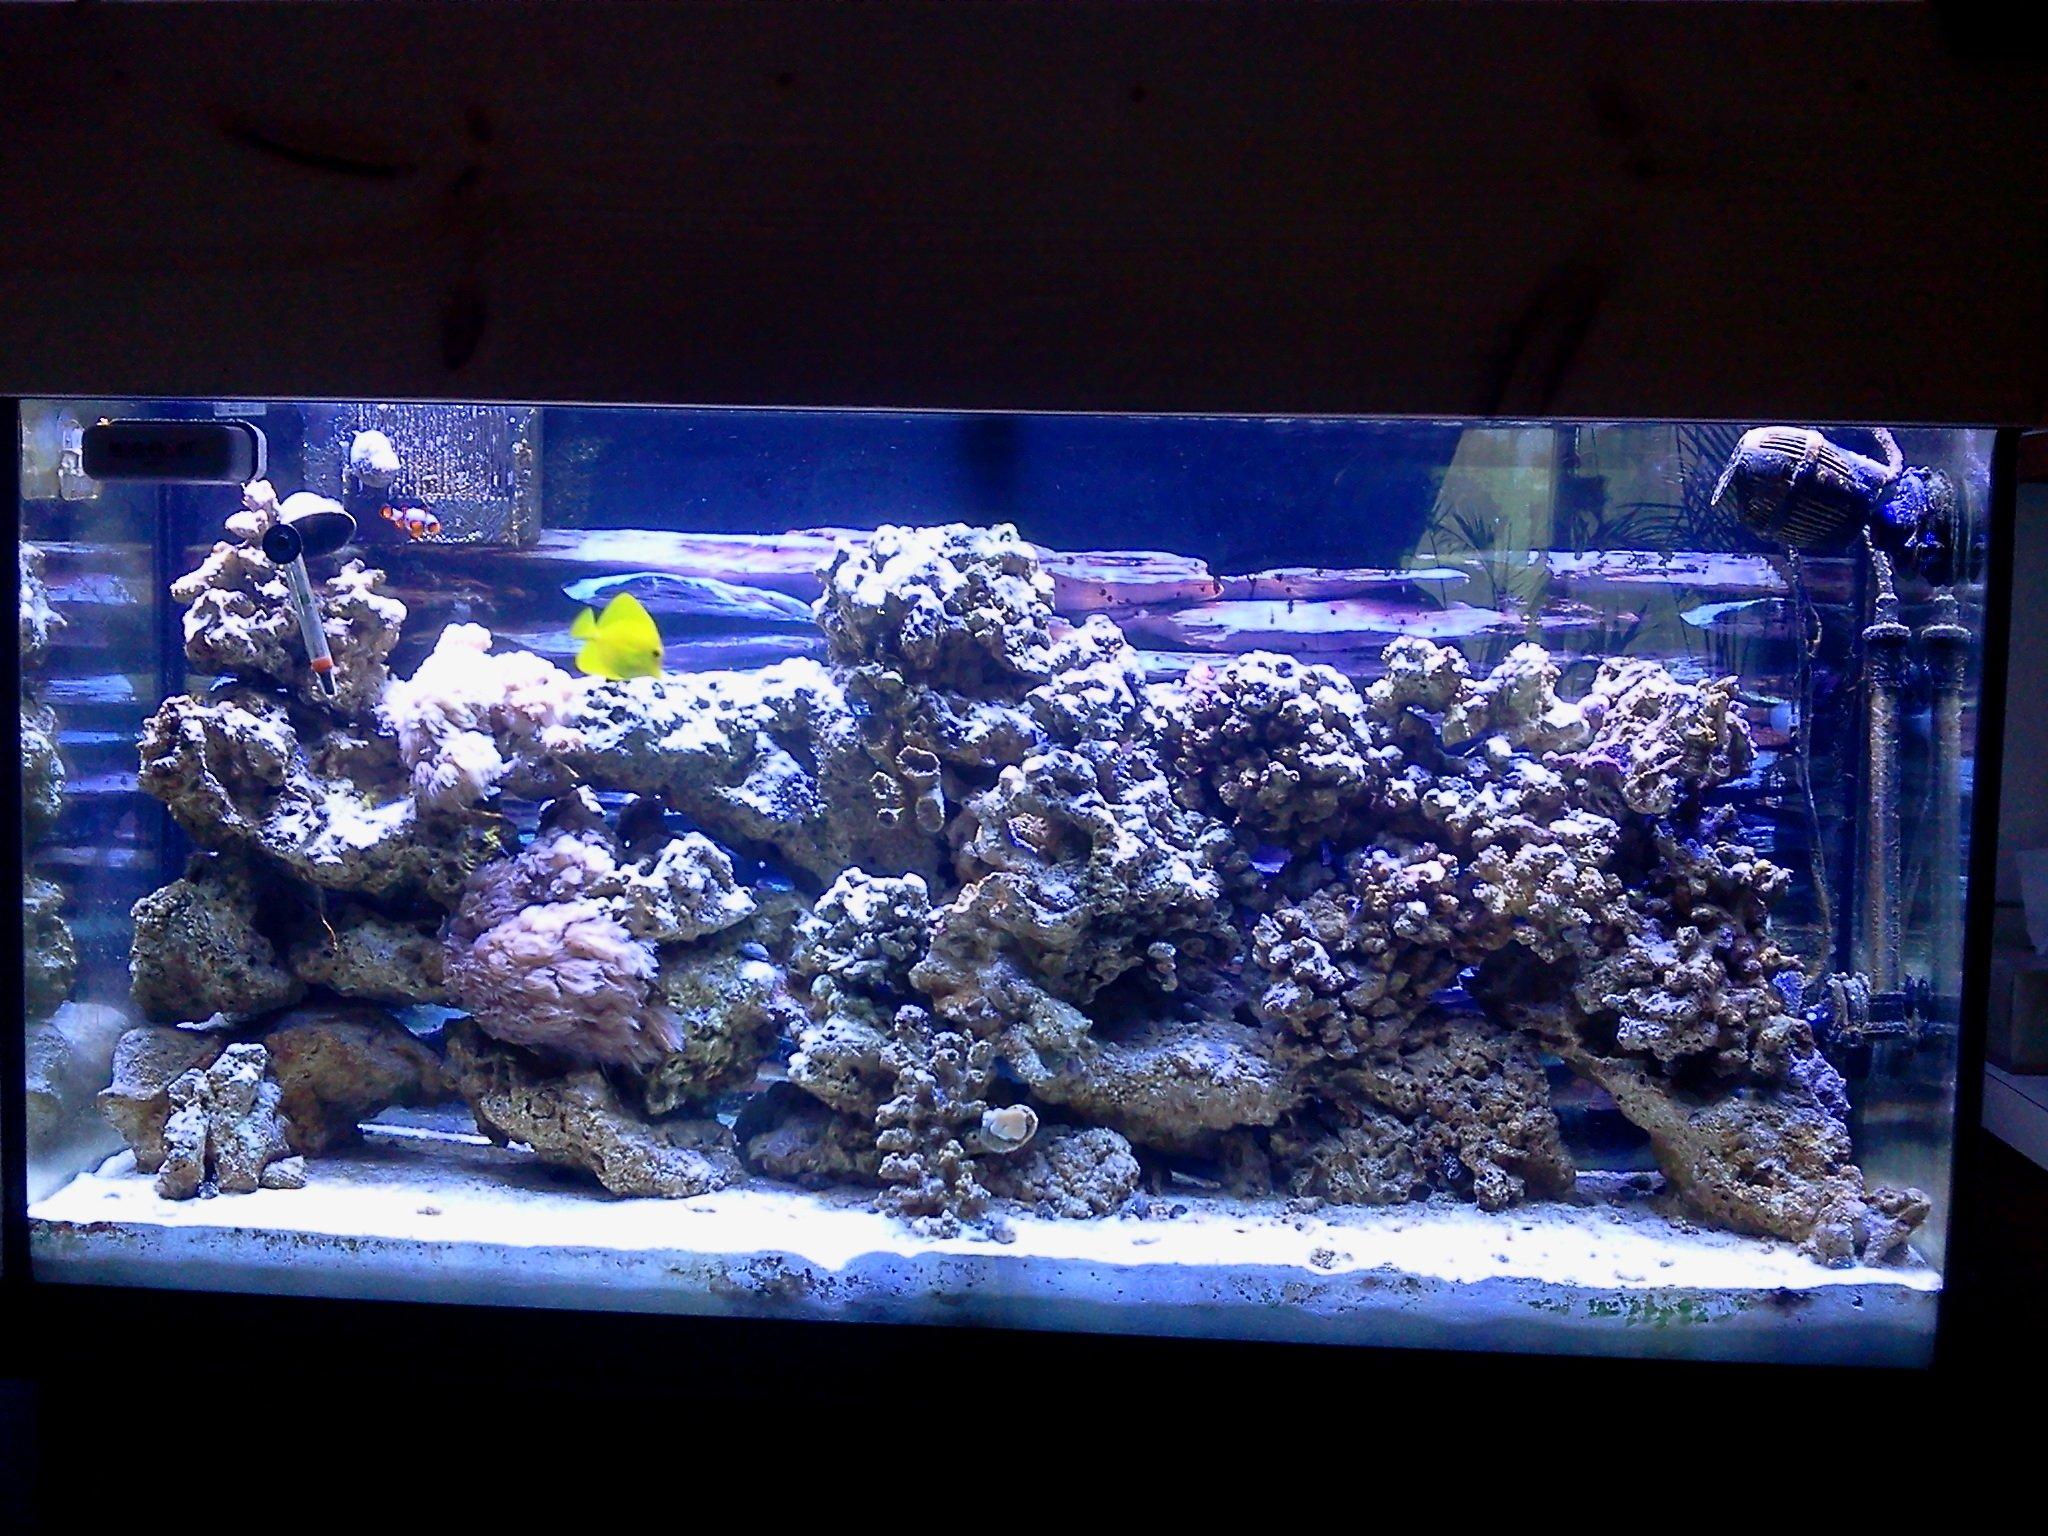 Saltwater fish 60 gallon large marine aquarium 60 gallon for 60 gallon fish tank